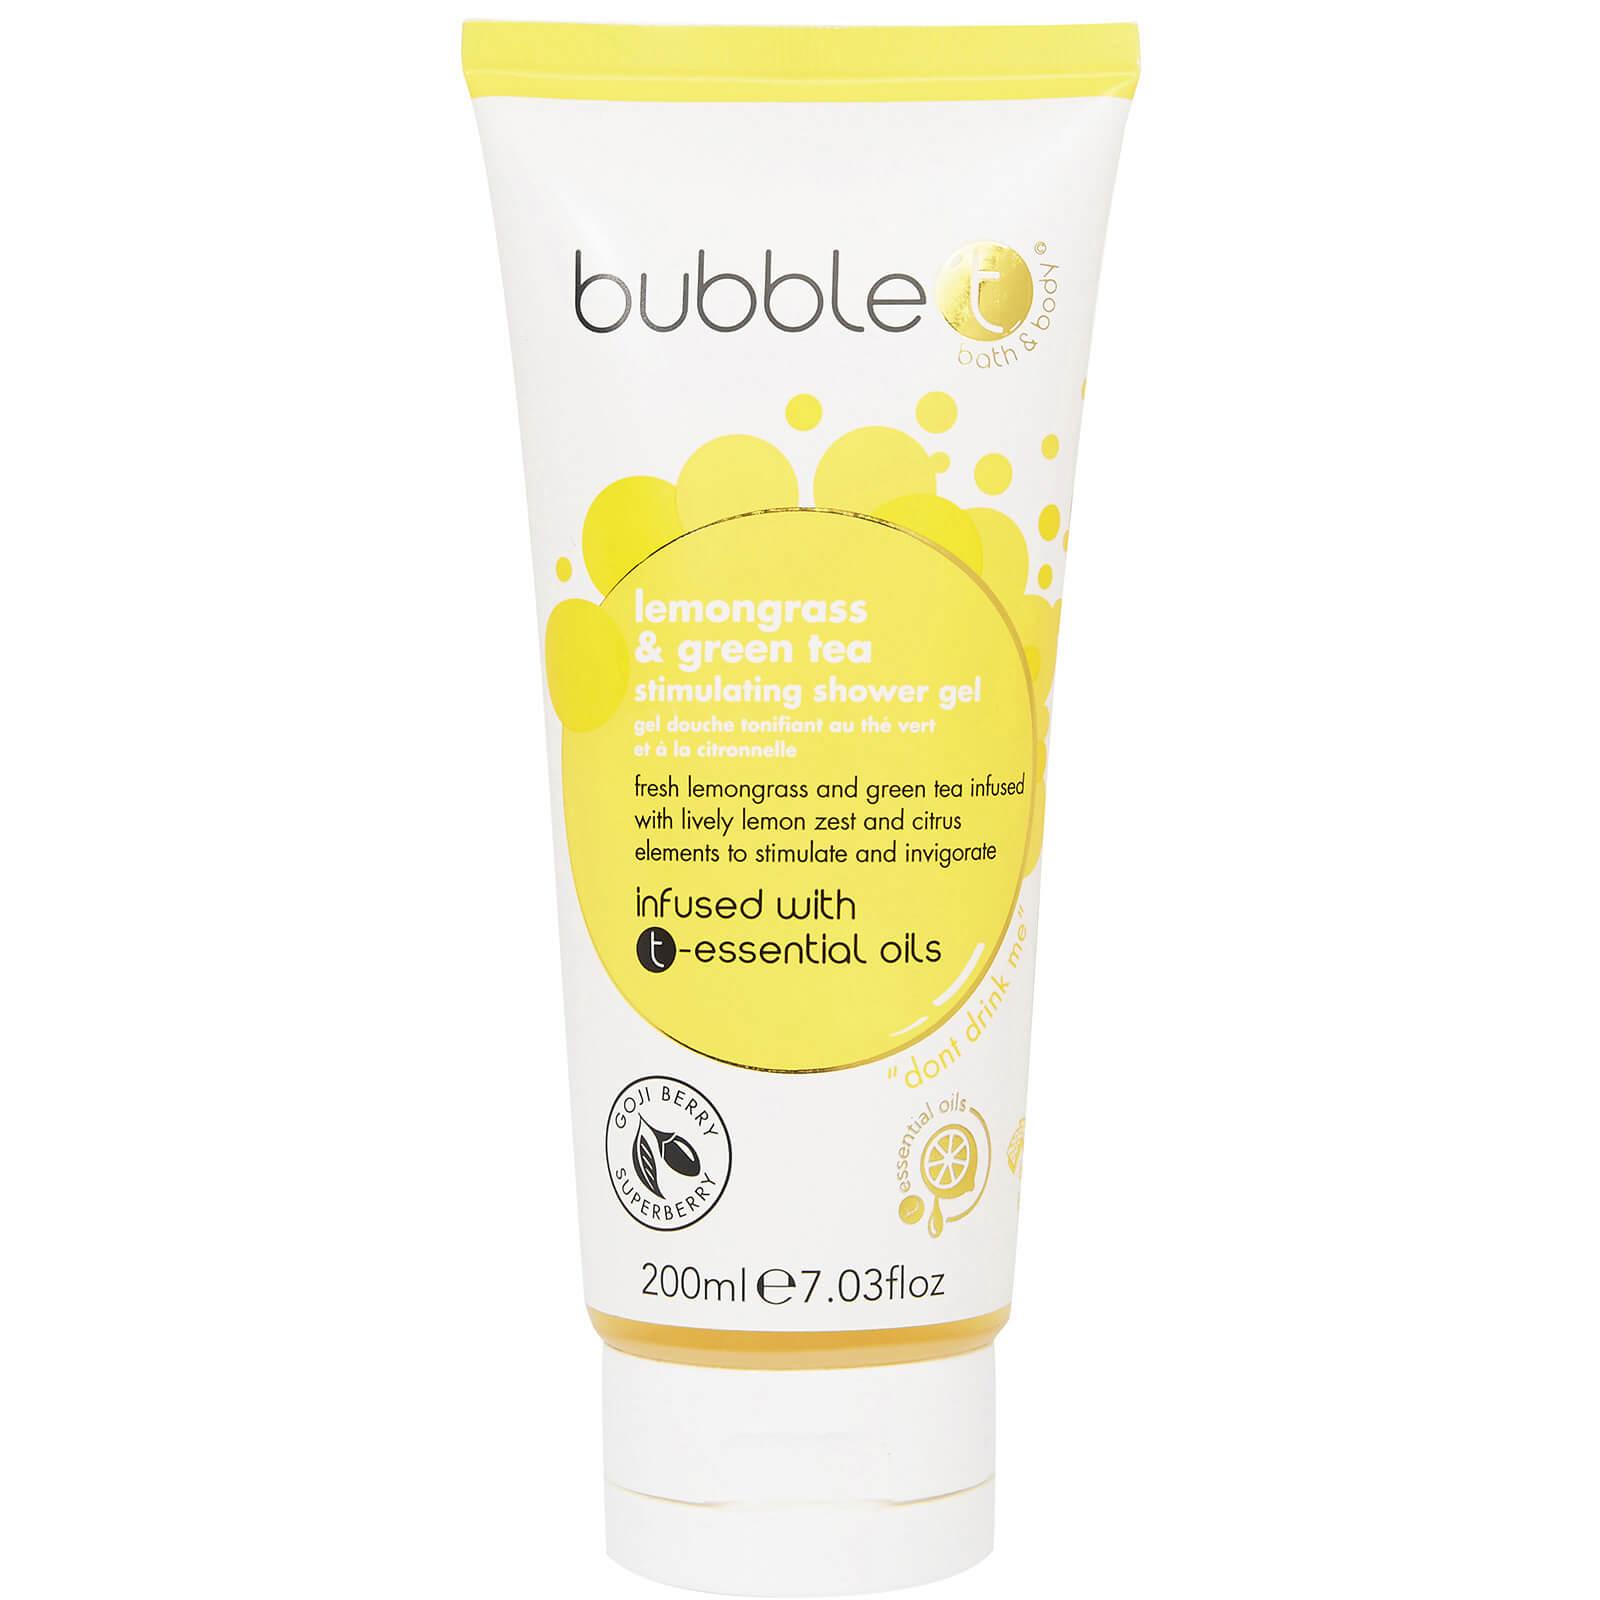 Купить Bubble T Shower Gel - Lemongrass & Green Tea 200 мл